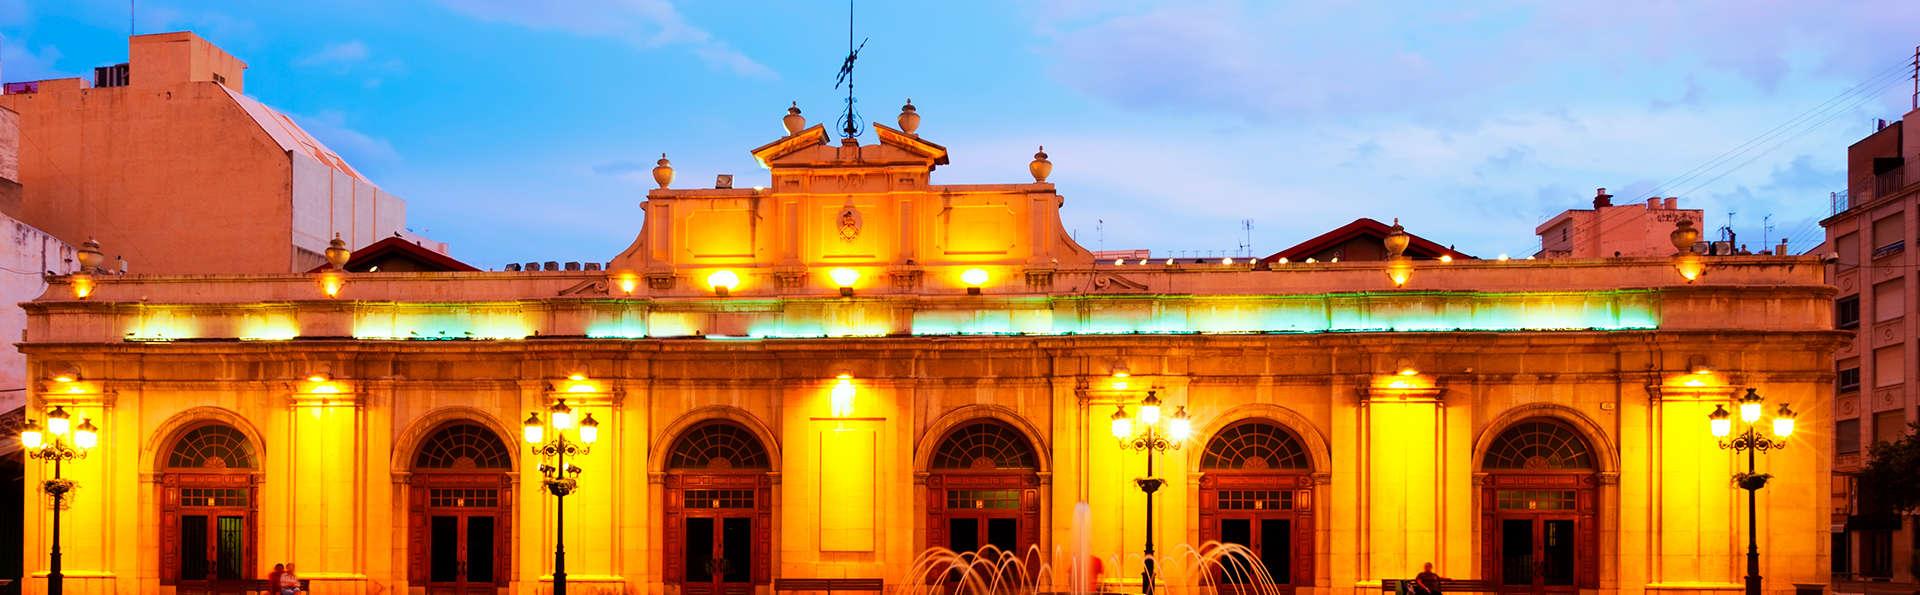 Hotel Rostits - edit_castellon_de_la_plana2.jpg